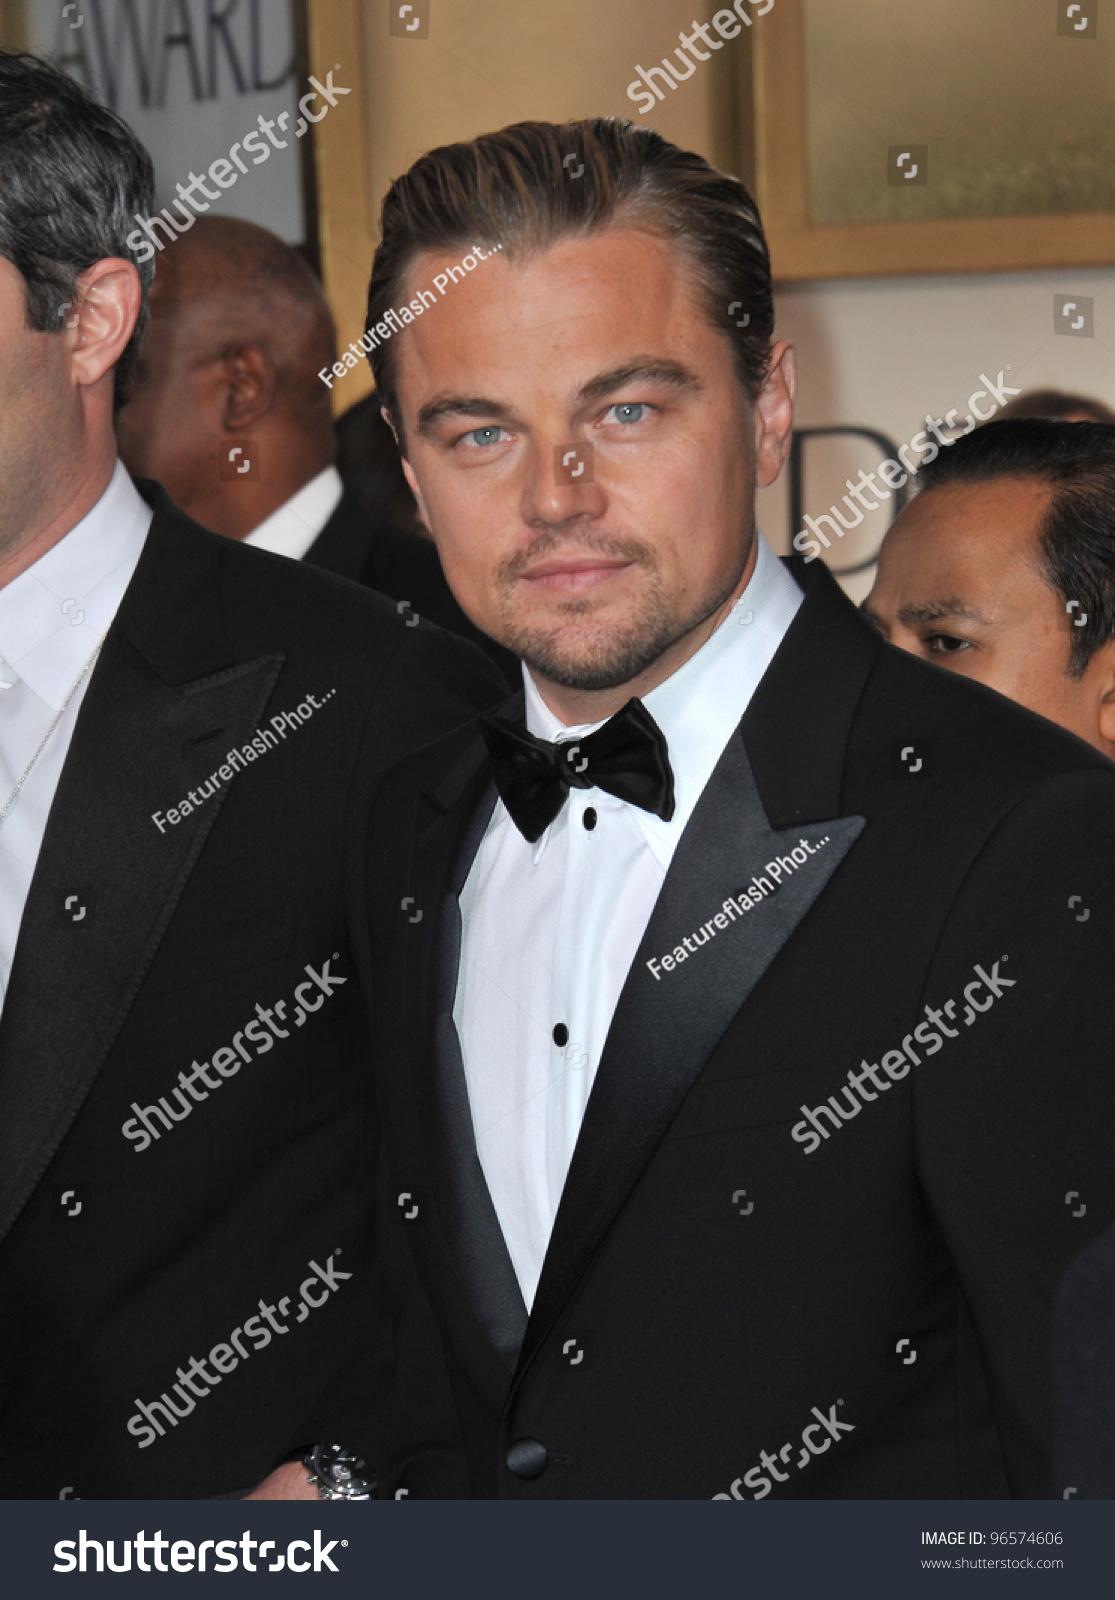 Leonardo Dicaprio At The 69th Golden Globe Awards Beverly Hilton Hotel January 15